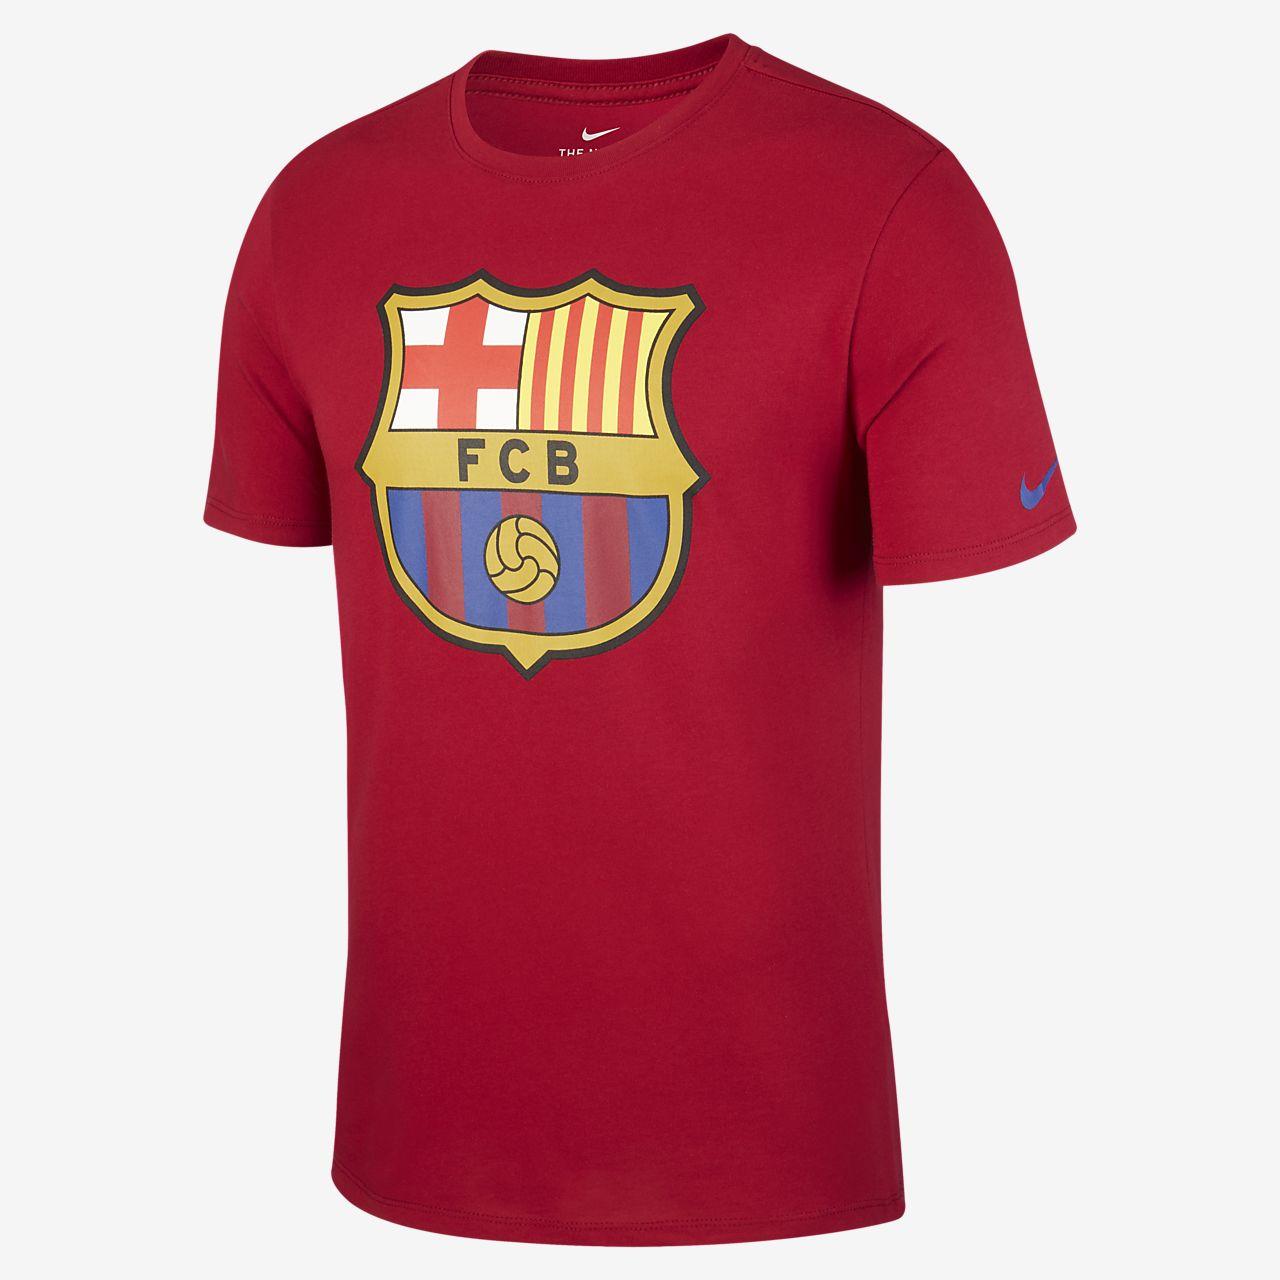 FC Barcelona Crest Camiseta - Hombre. Nike.com ES 2002cec344e